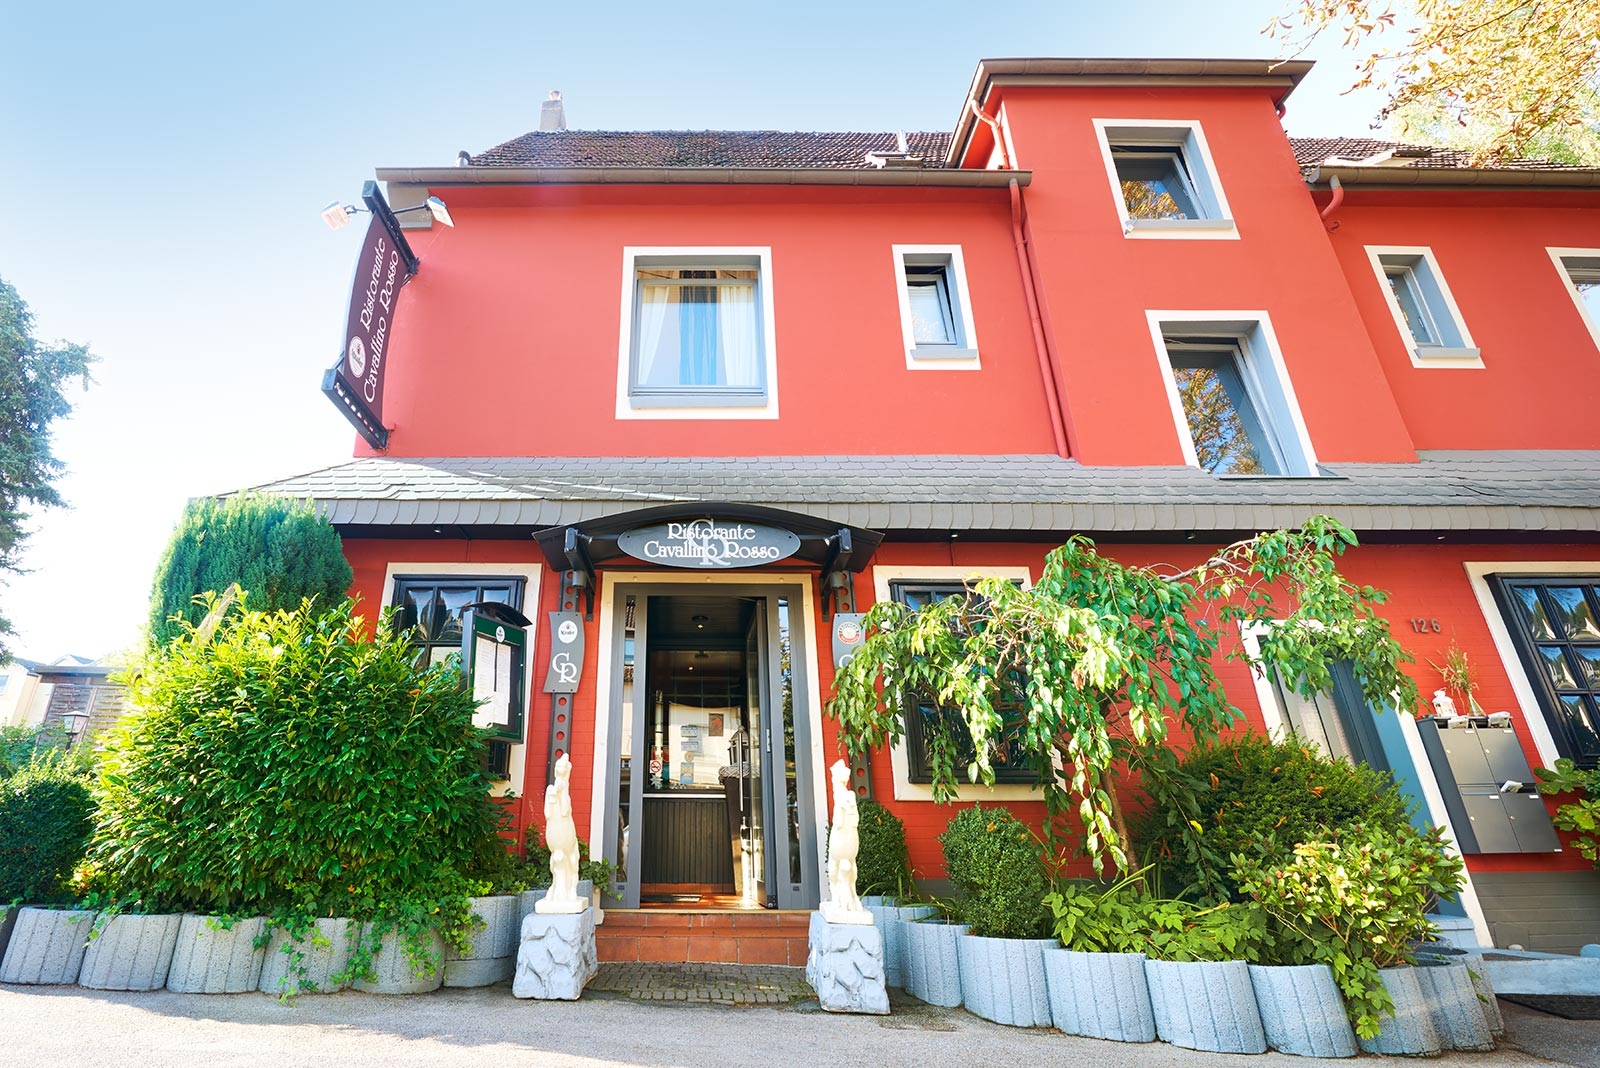 Immobilie in Essen (Werden): Gastronomie